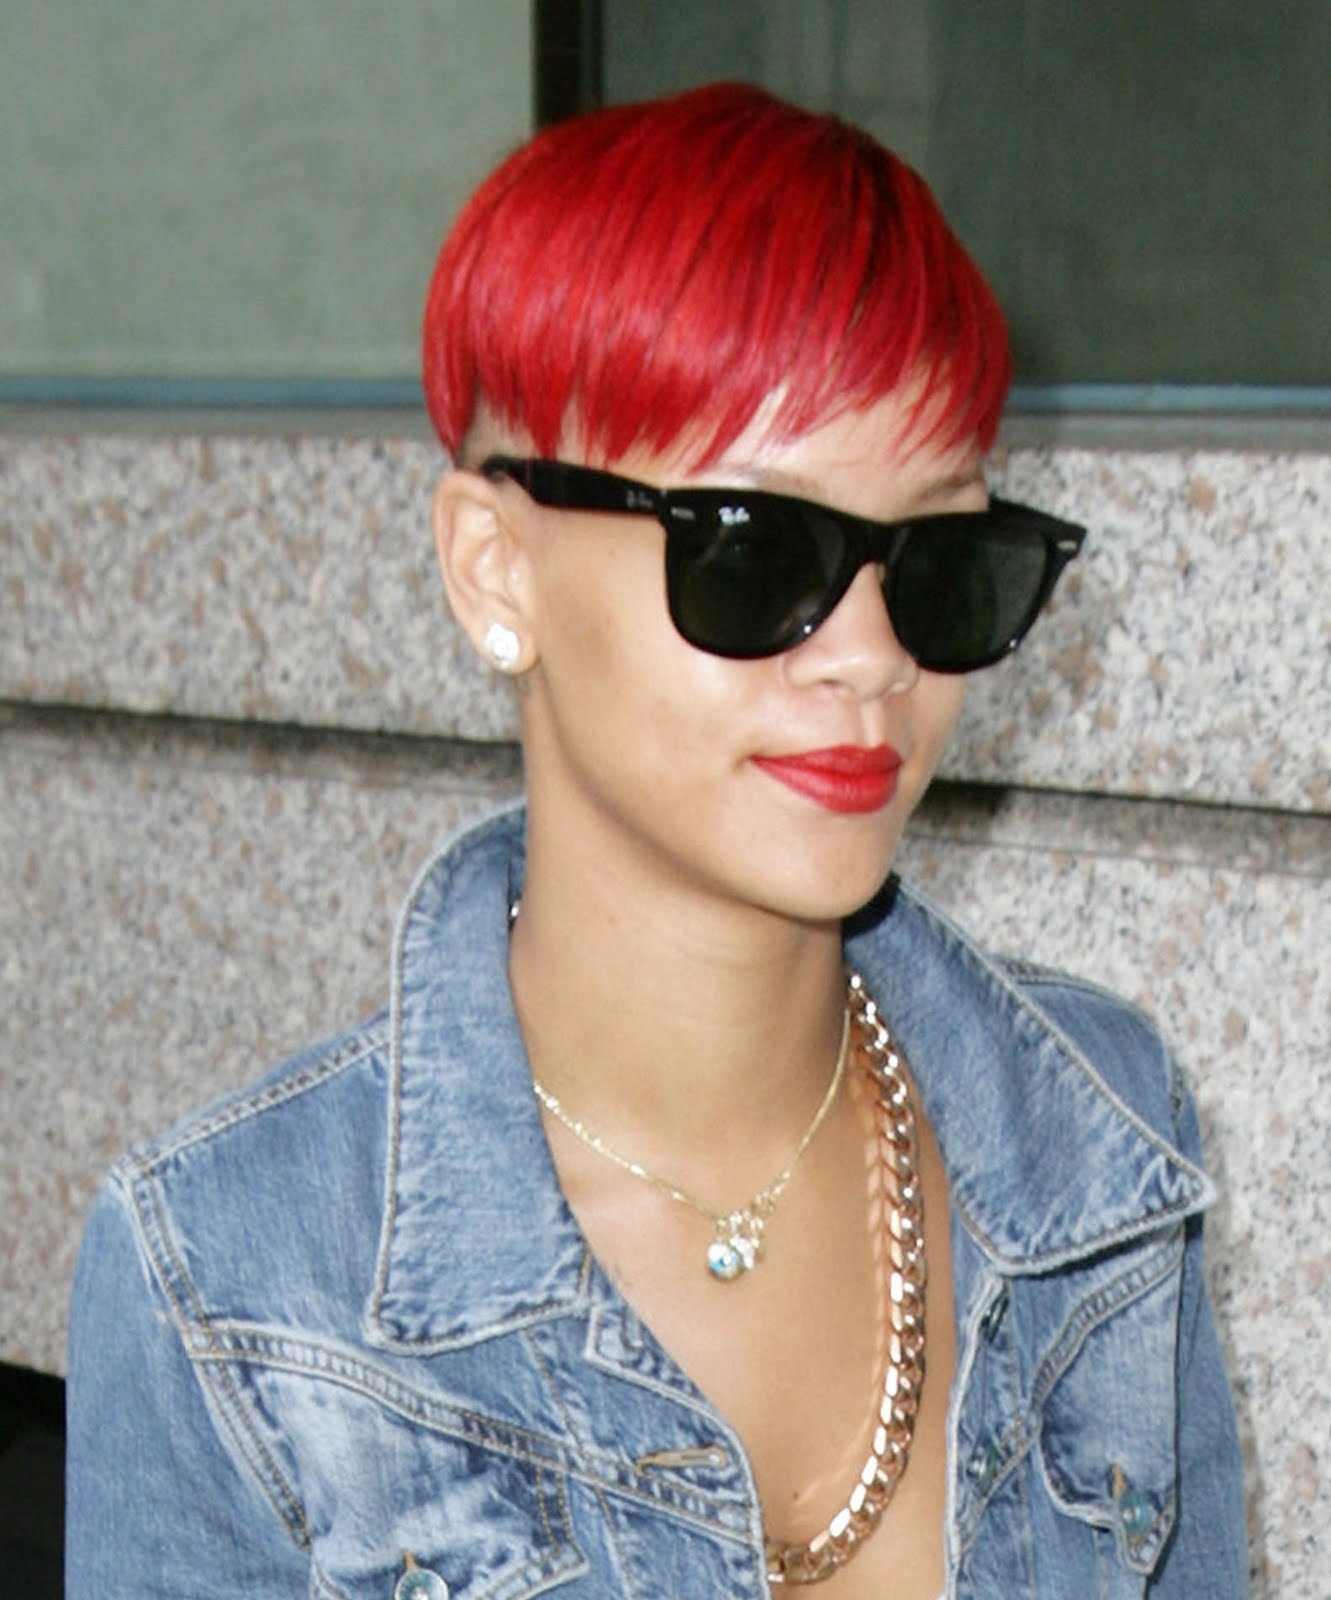 http://1.bp.blogspot.com/-lDSfcp-4zZ8/UEB94FRbd9I/AAAAAAAAE5Y/mUCruTMfQtY/s1600/rihanna-red-hair-4.jpg